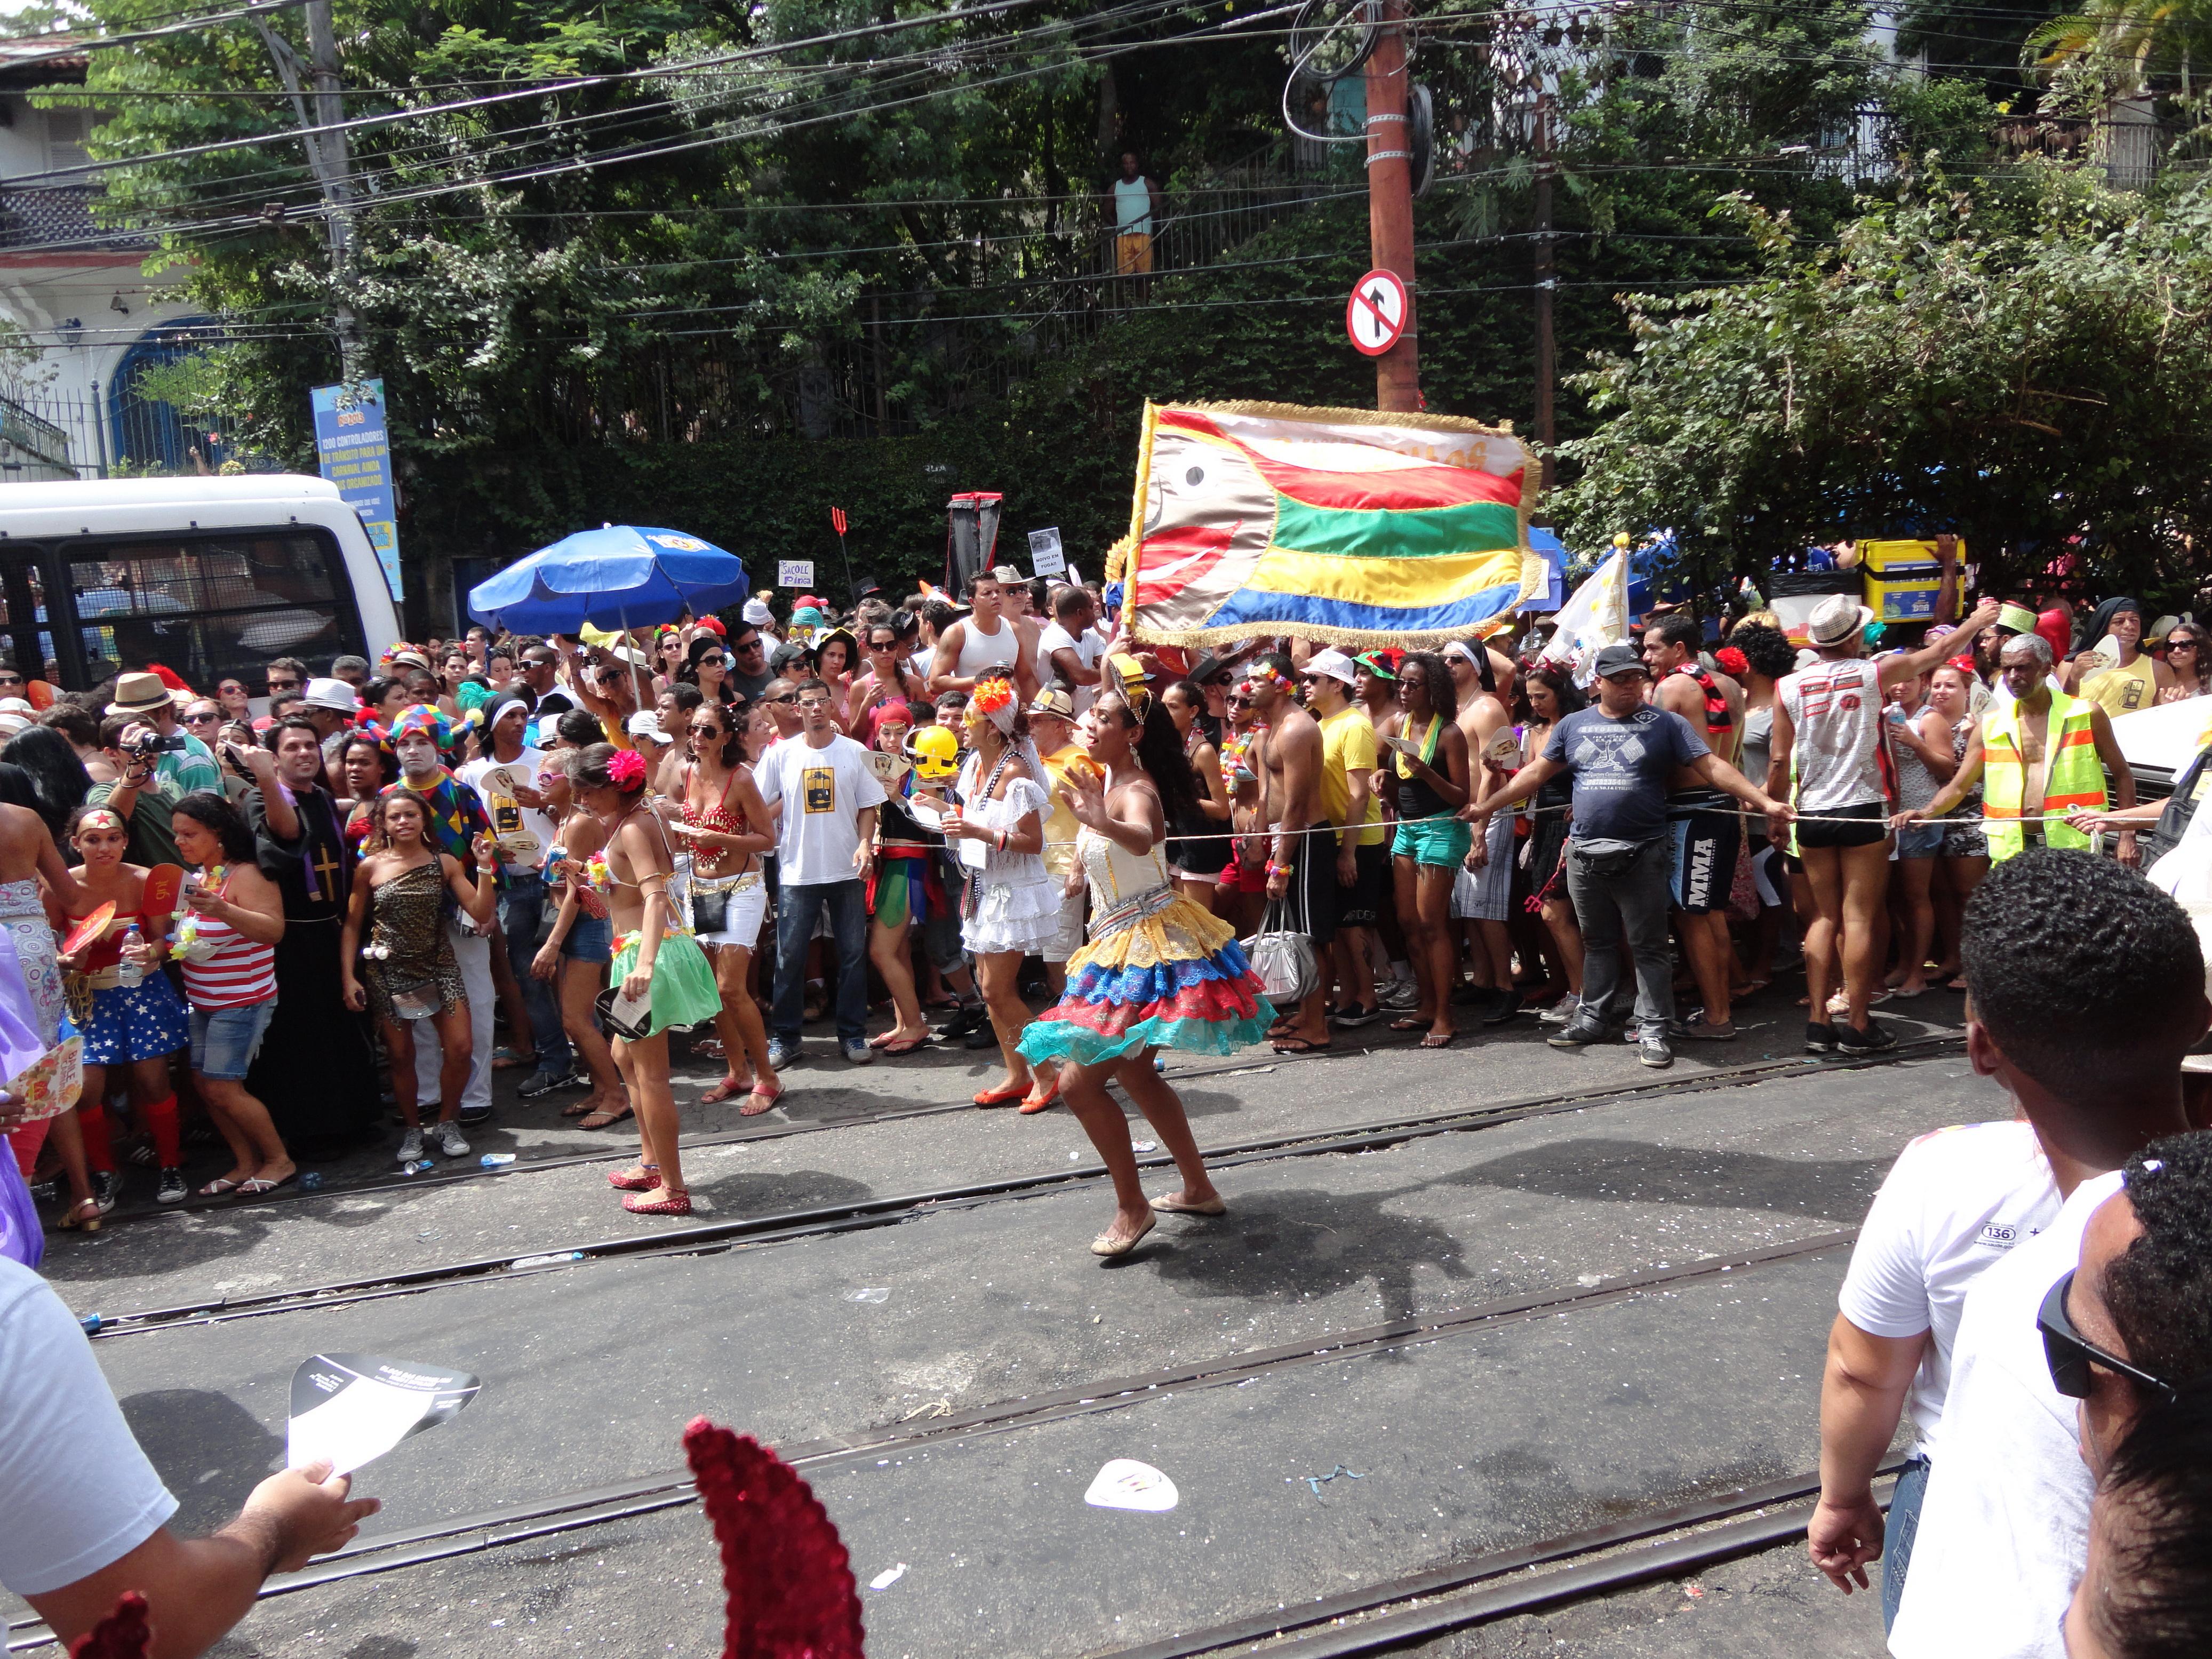 Rio 2013 - Santa Tereza - Carmelitas 014 by GabrielBB